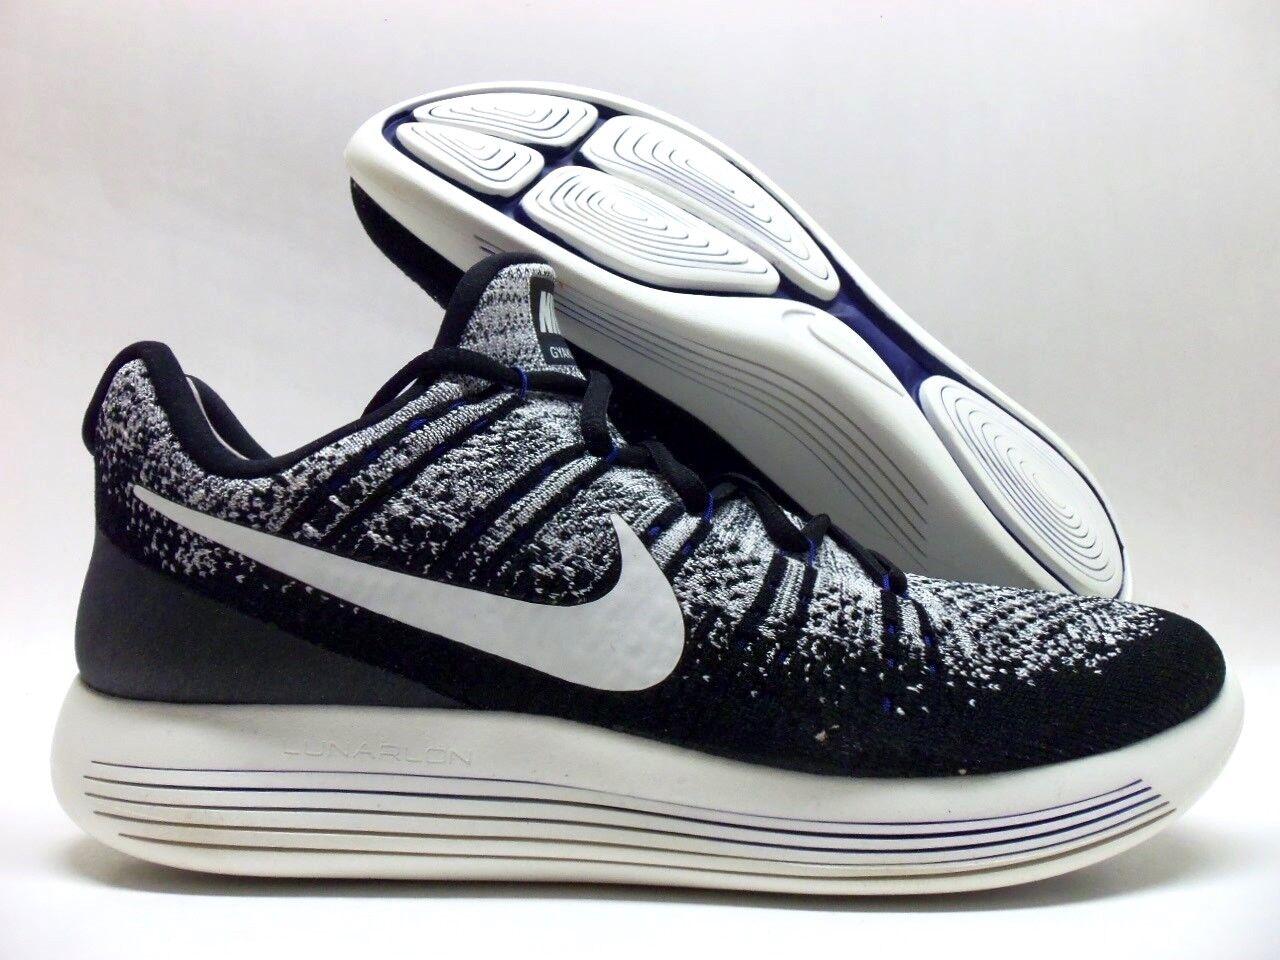 Nike lunarepic basso fk 2 gyakusou nero uomini / sail-blue fox dimensioni uomini nero 11 [880283-001] 2f2c8a